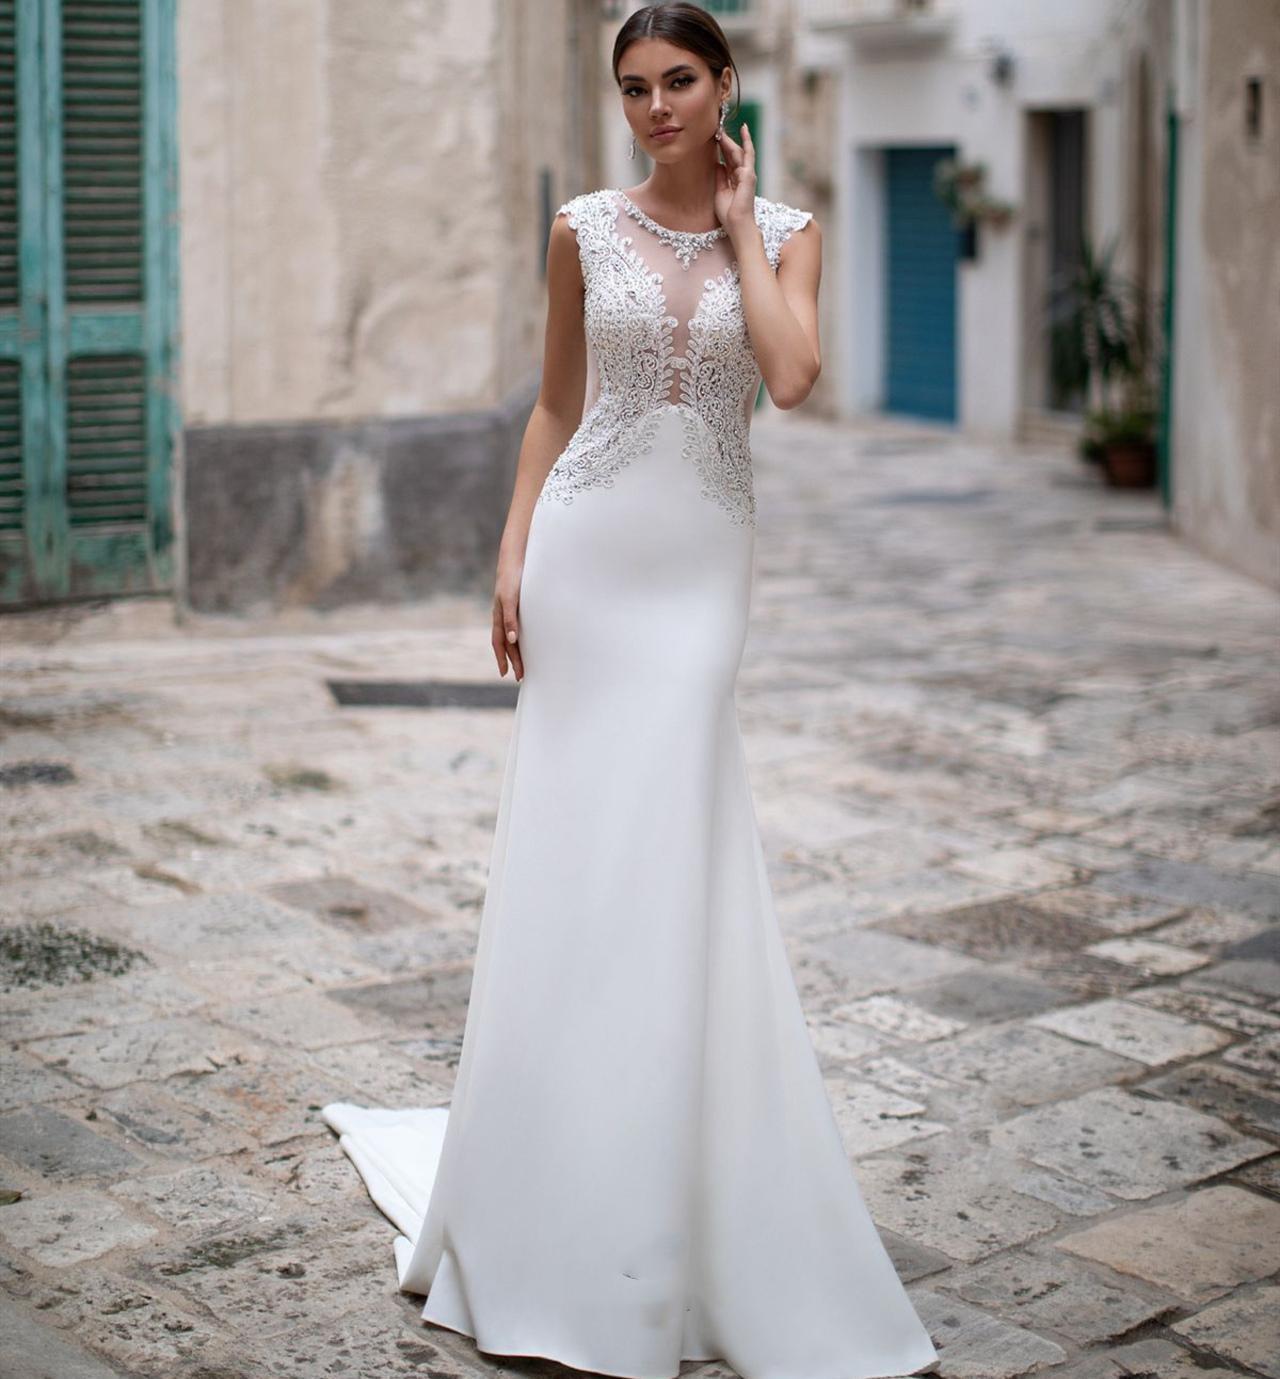 Neue Art-Nixe Brautkleider 20210 O-Ansatz Sleeveless Sweep Zug Friesen Appliques Satin Braut-Kleider Vestidos de novia